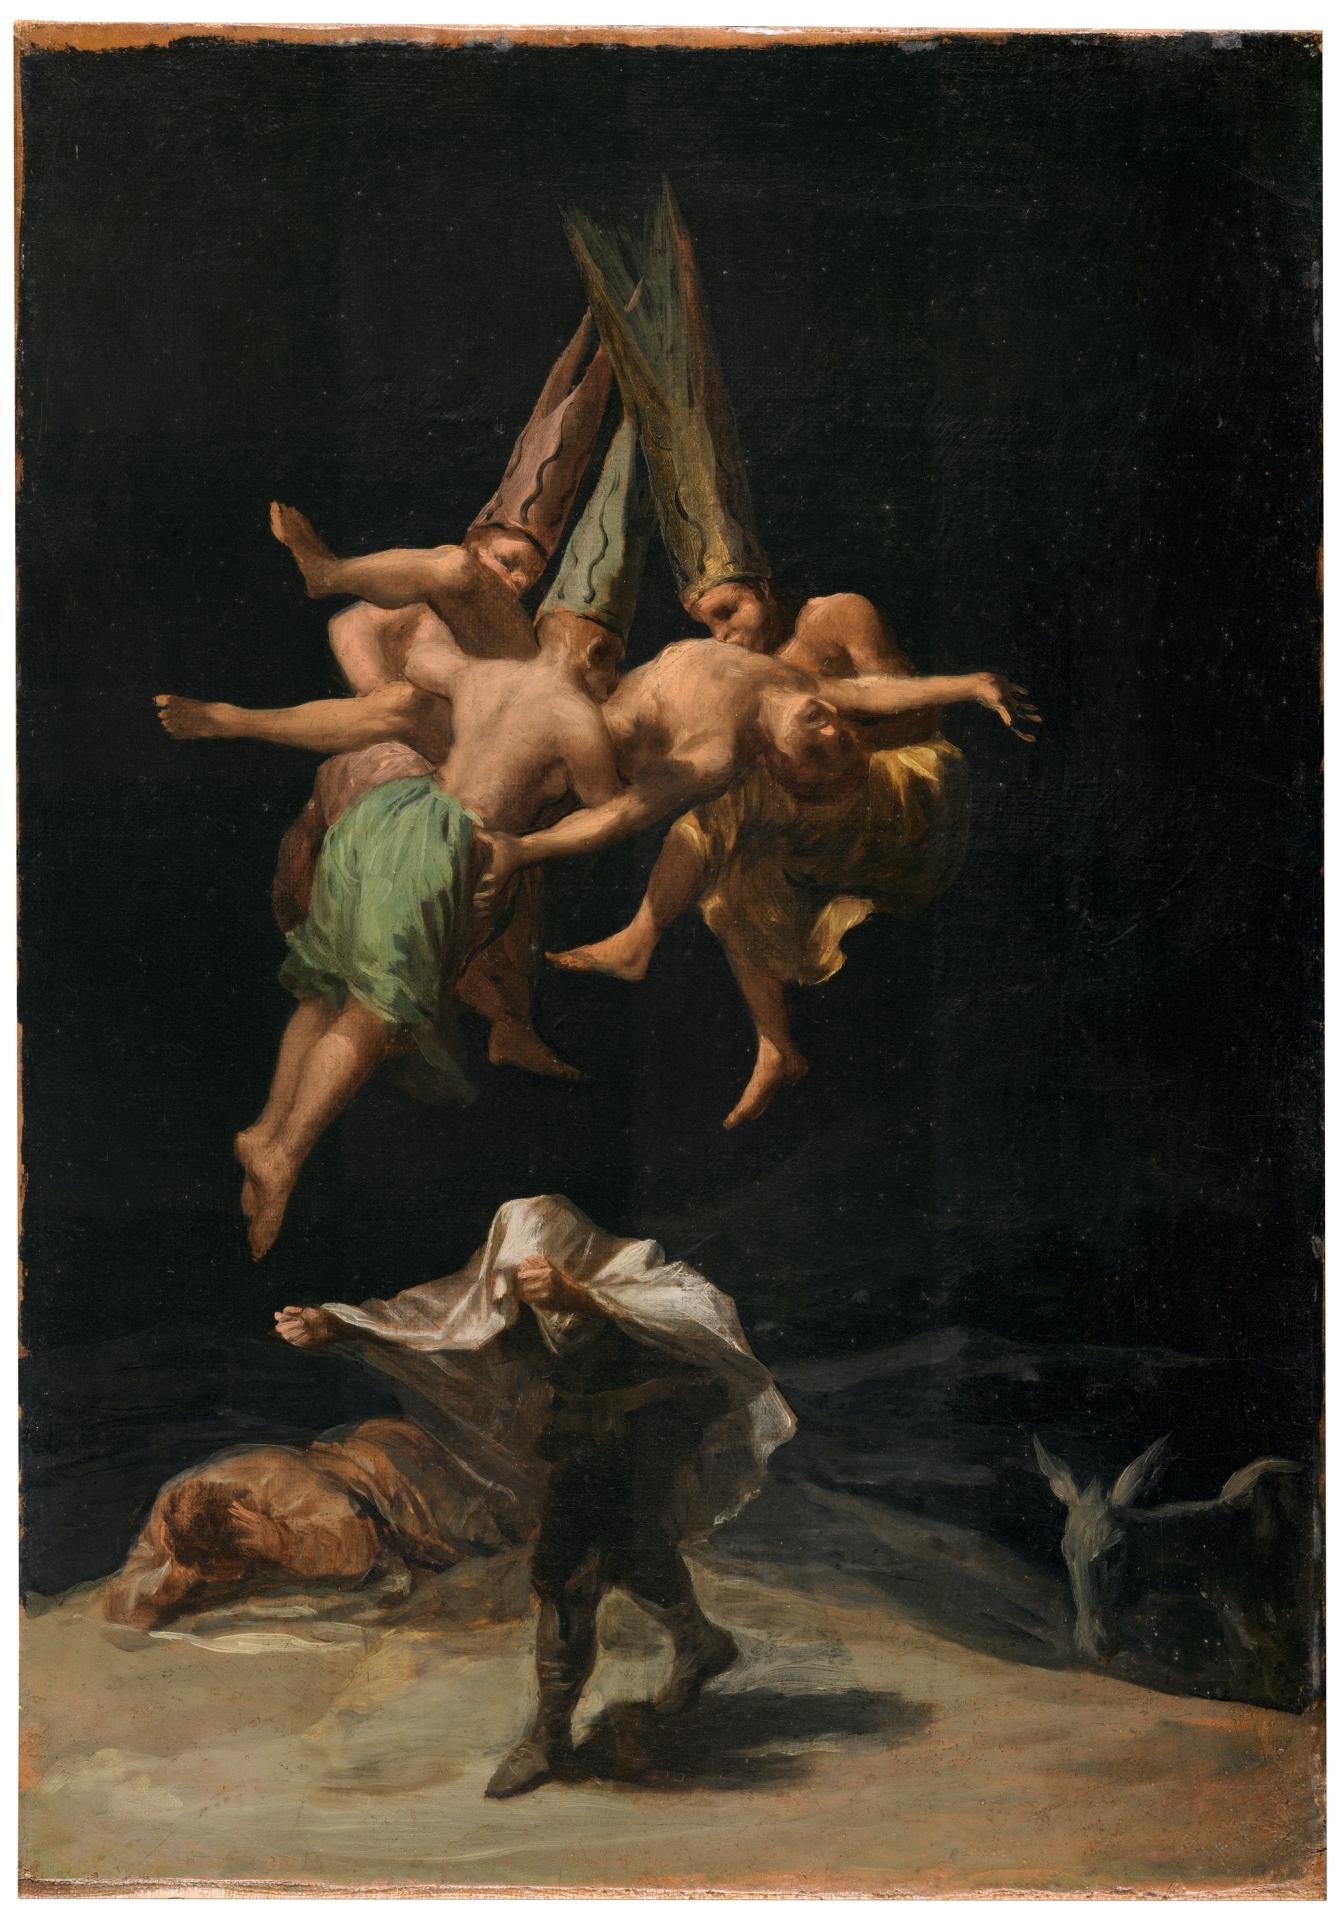 Witches' Flight - The Collection - Museo Nacional del Prado